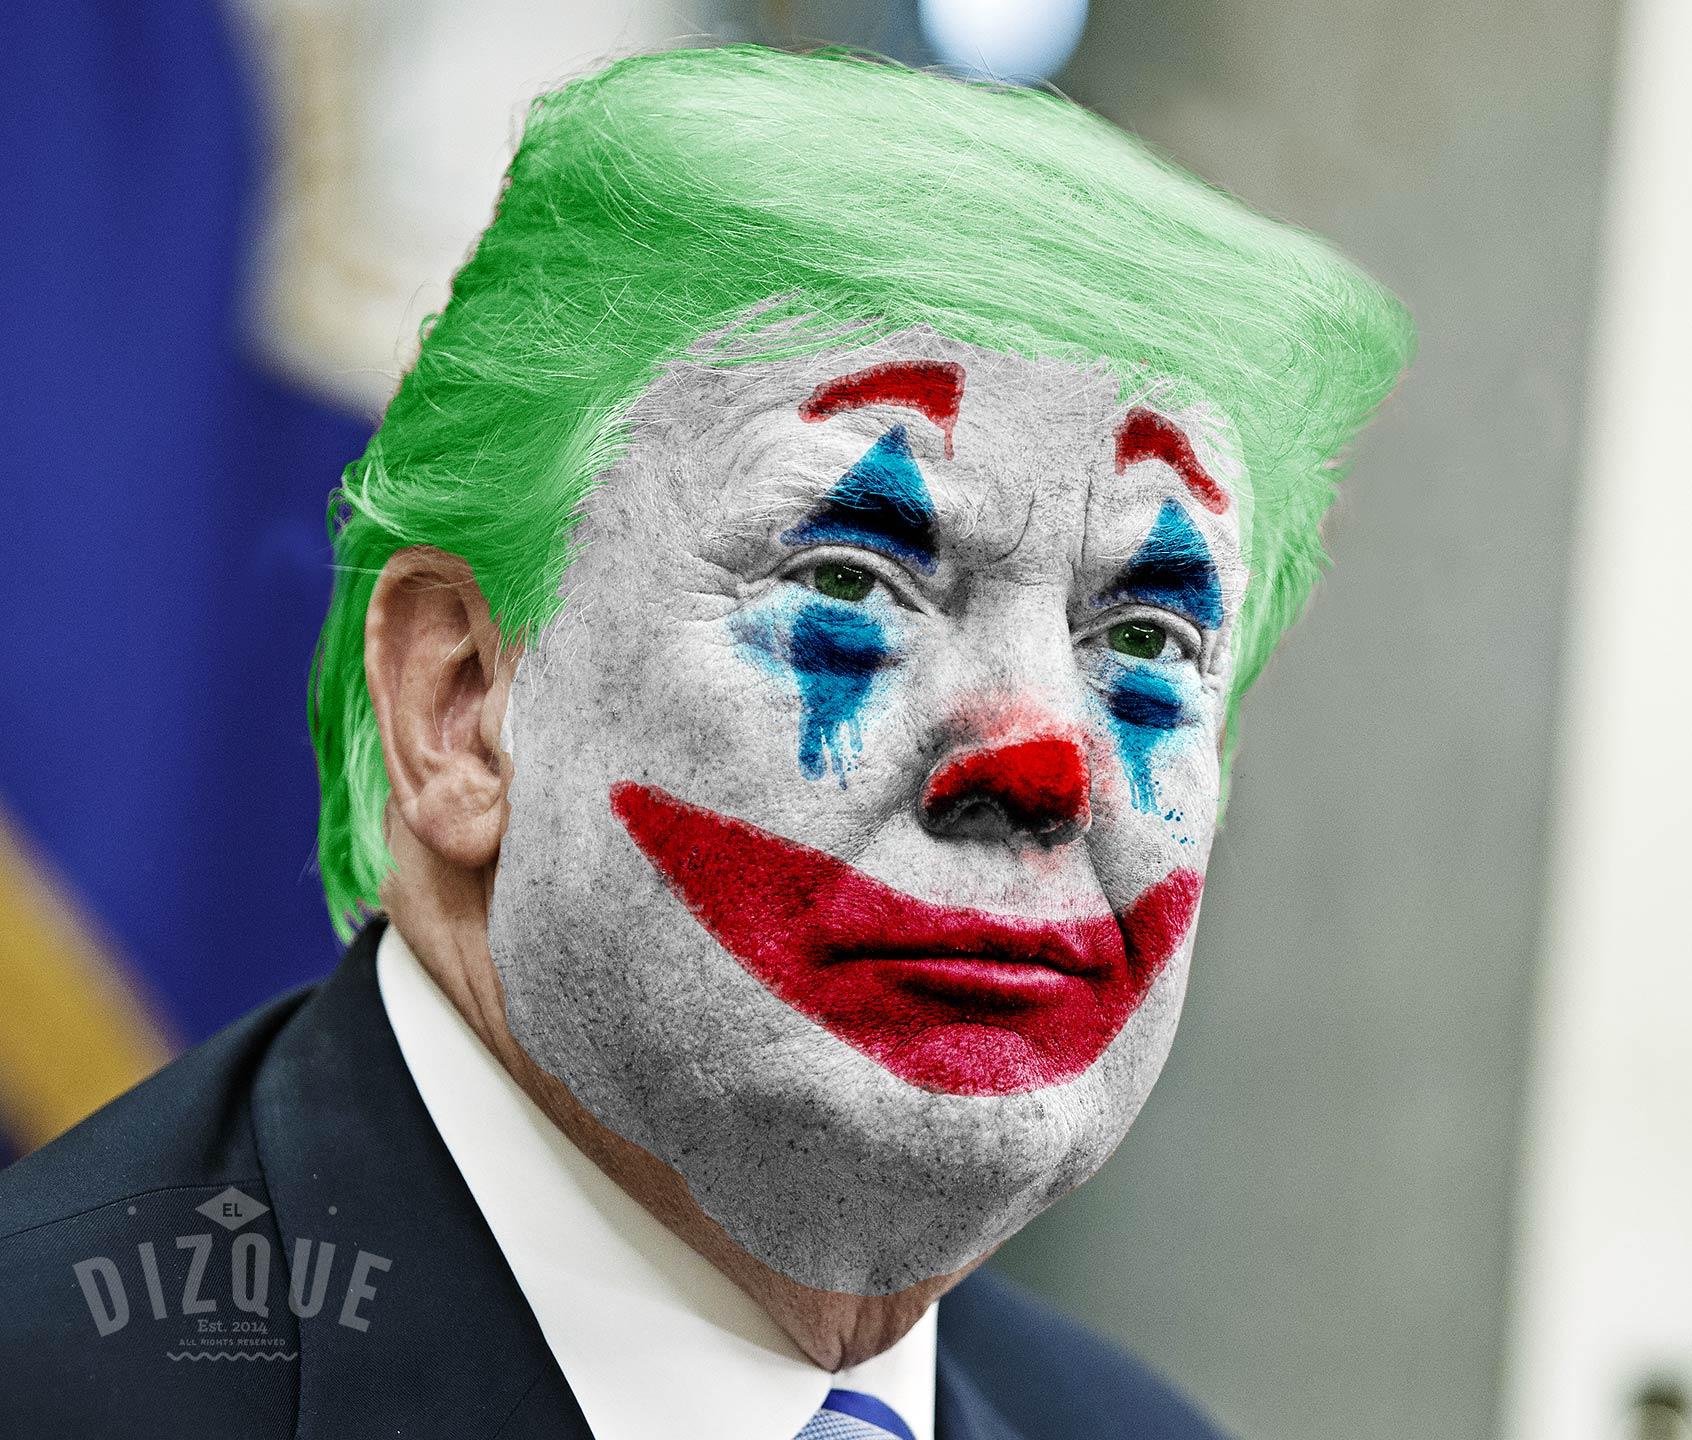 Causa sorpresa Donald Trump al maquillarse como el Joker